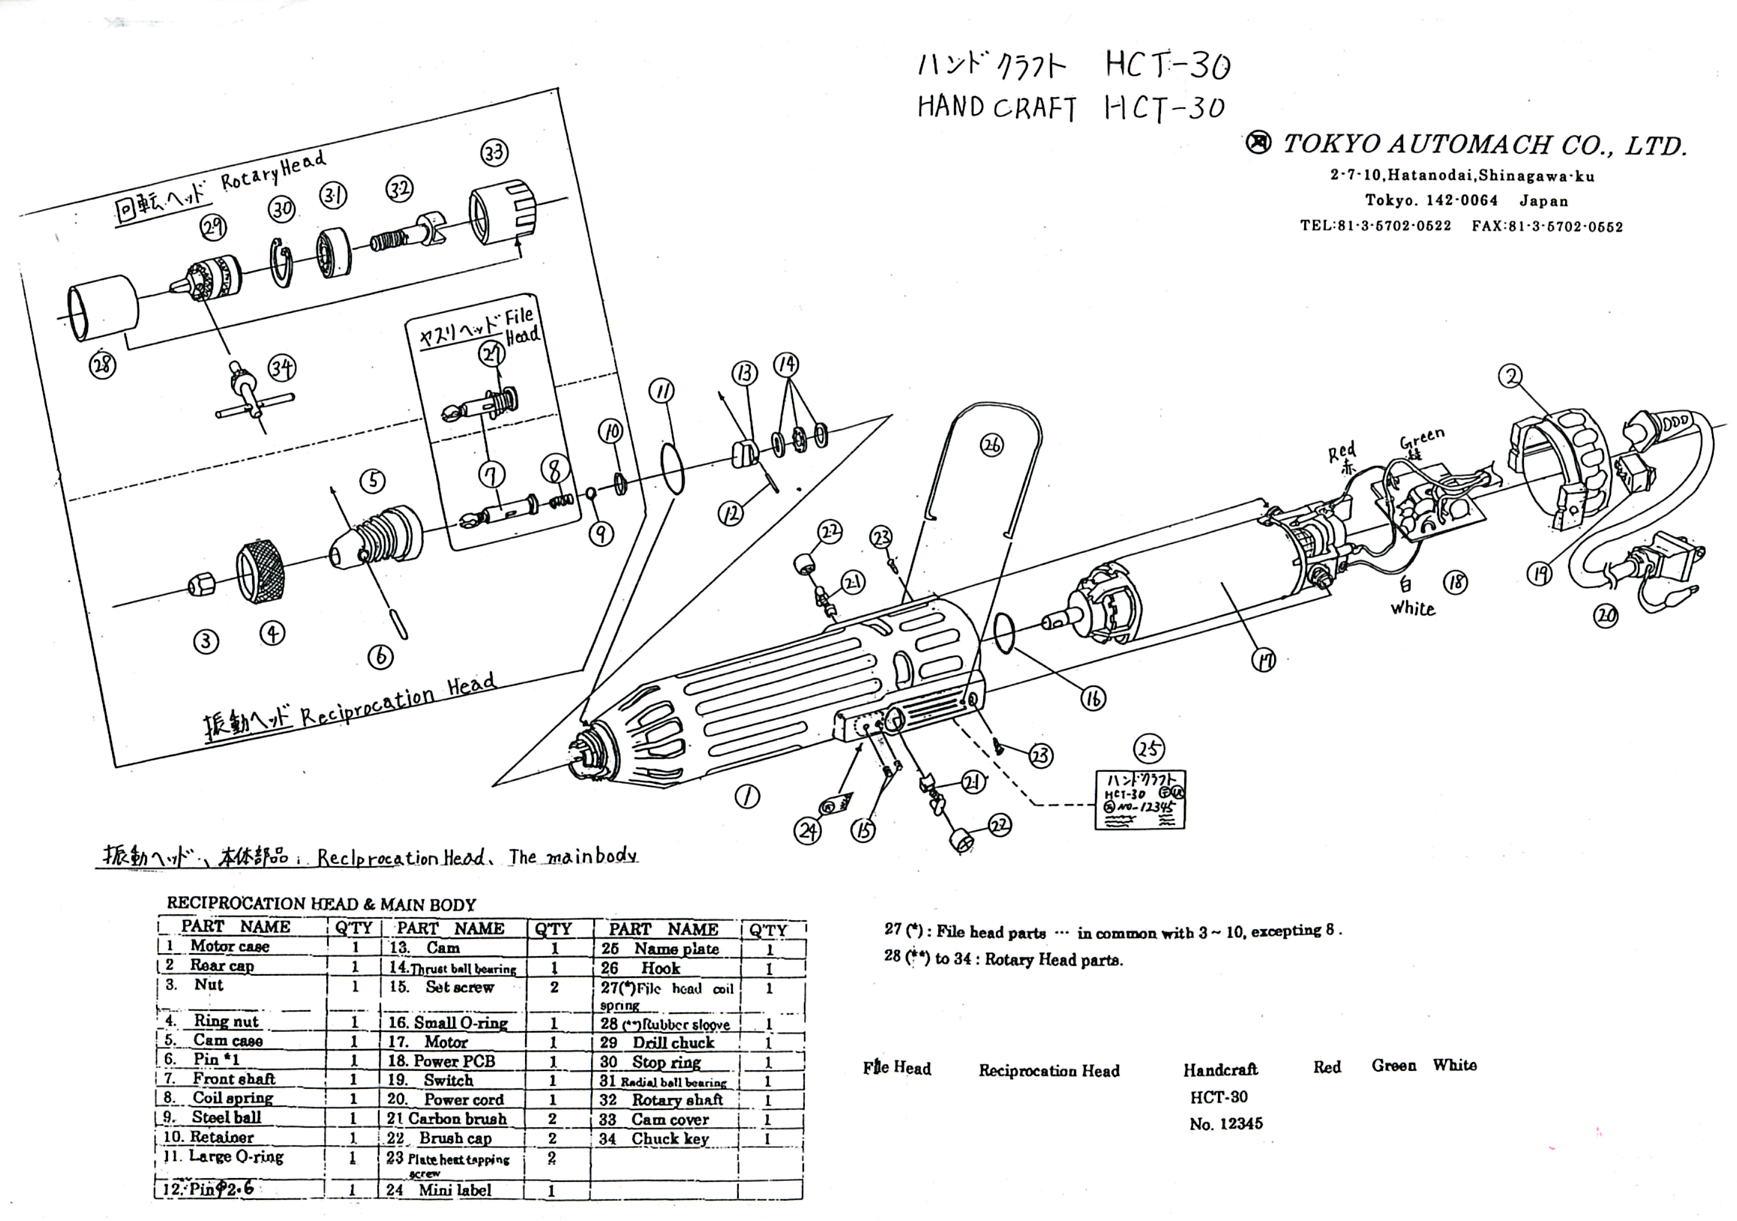 Parts Automach Maintenance Kits And Parts